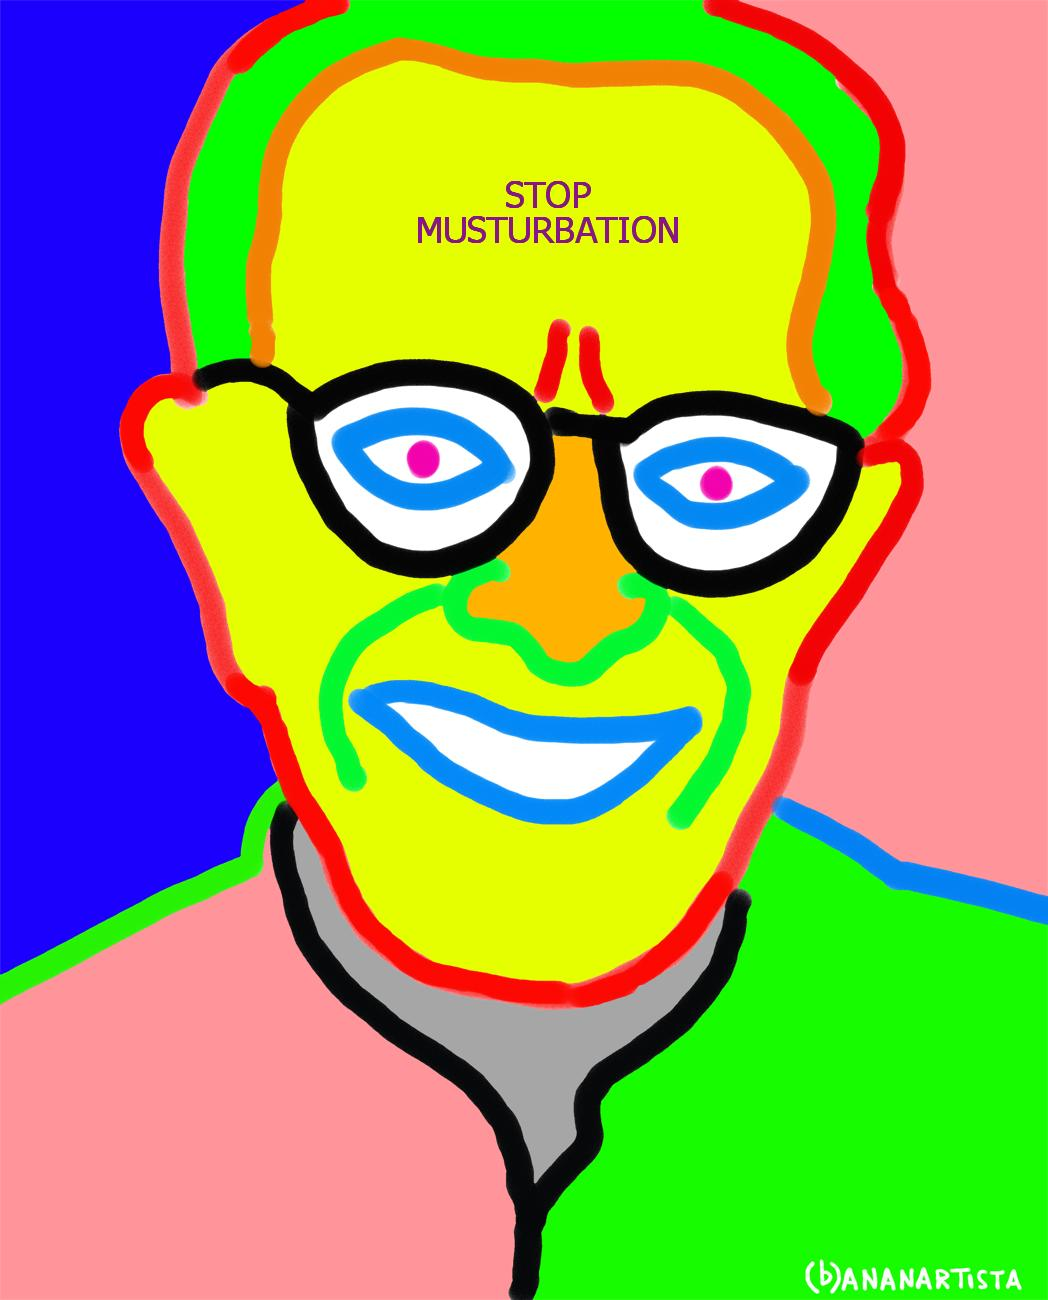 stop musturbation albert ellis portrait by (b)ananartista sbuff